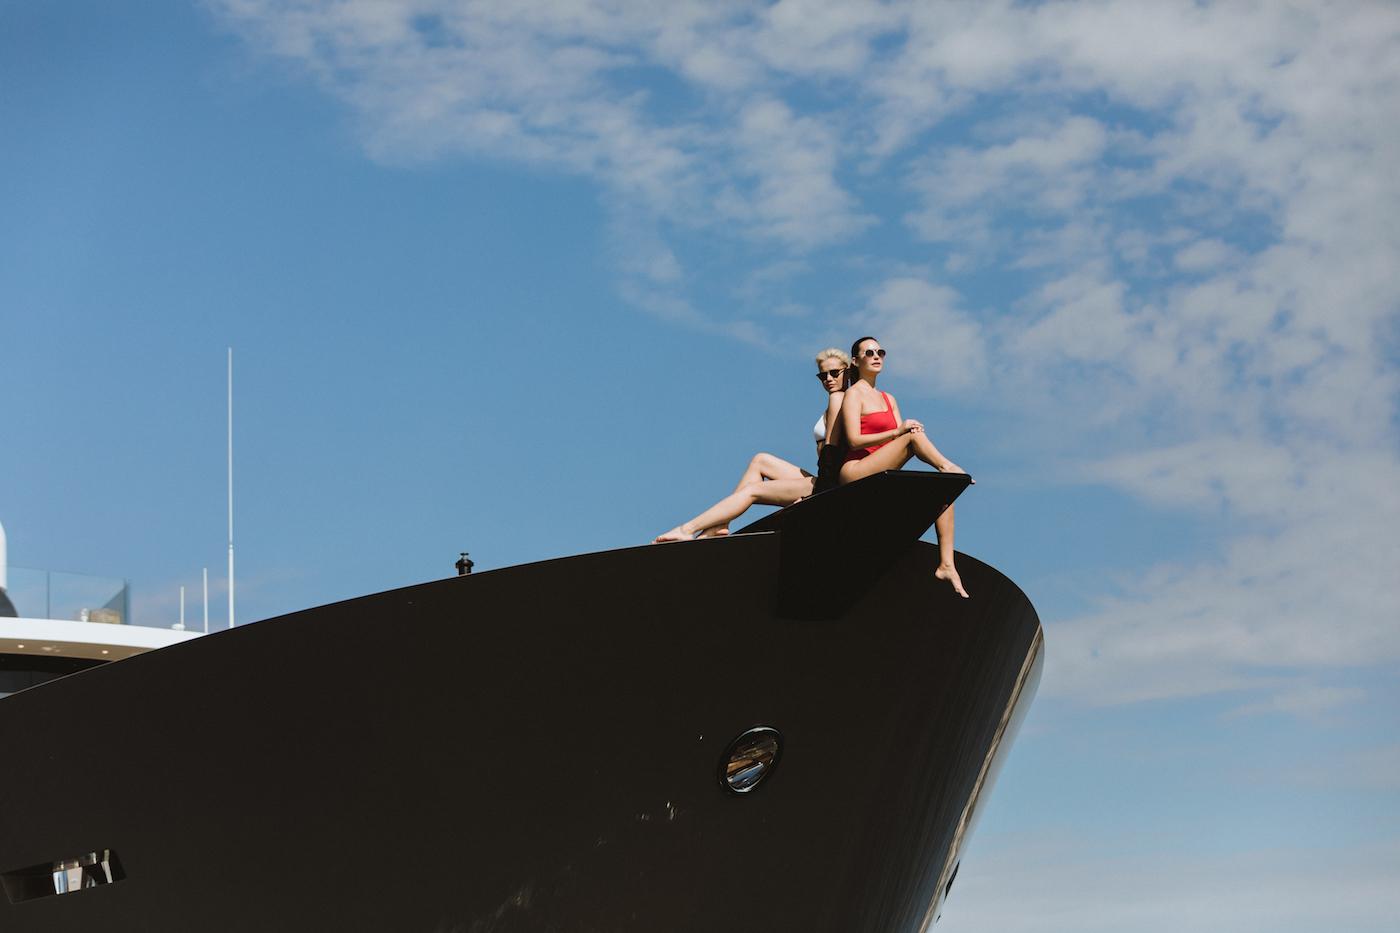 Alquiler de barcos en Formentera. Barcos de alquiler en Formentera